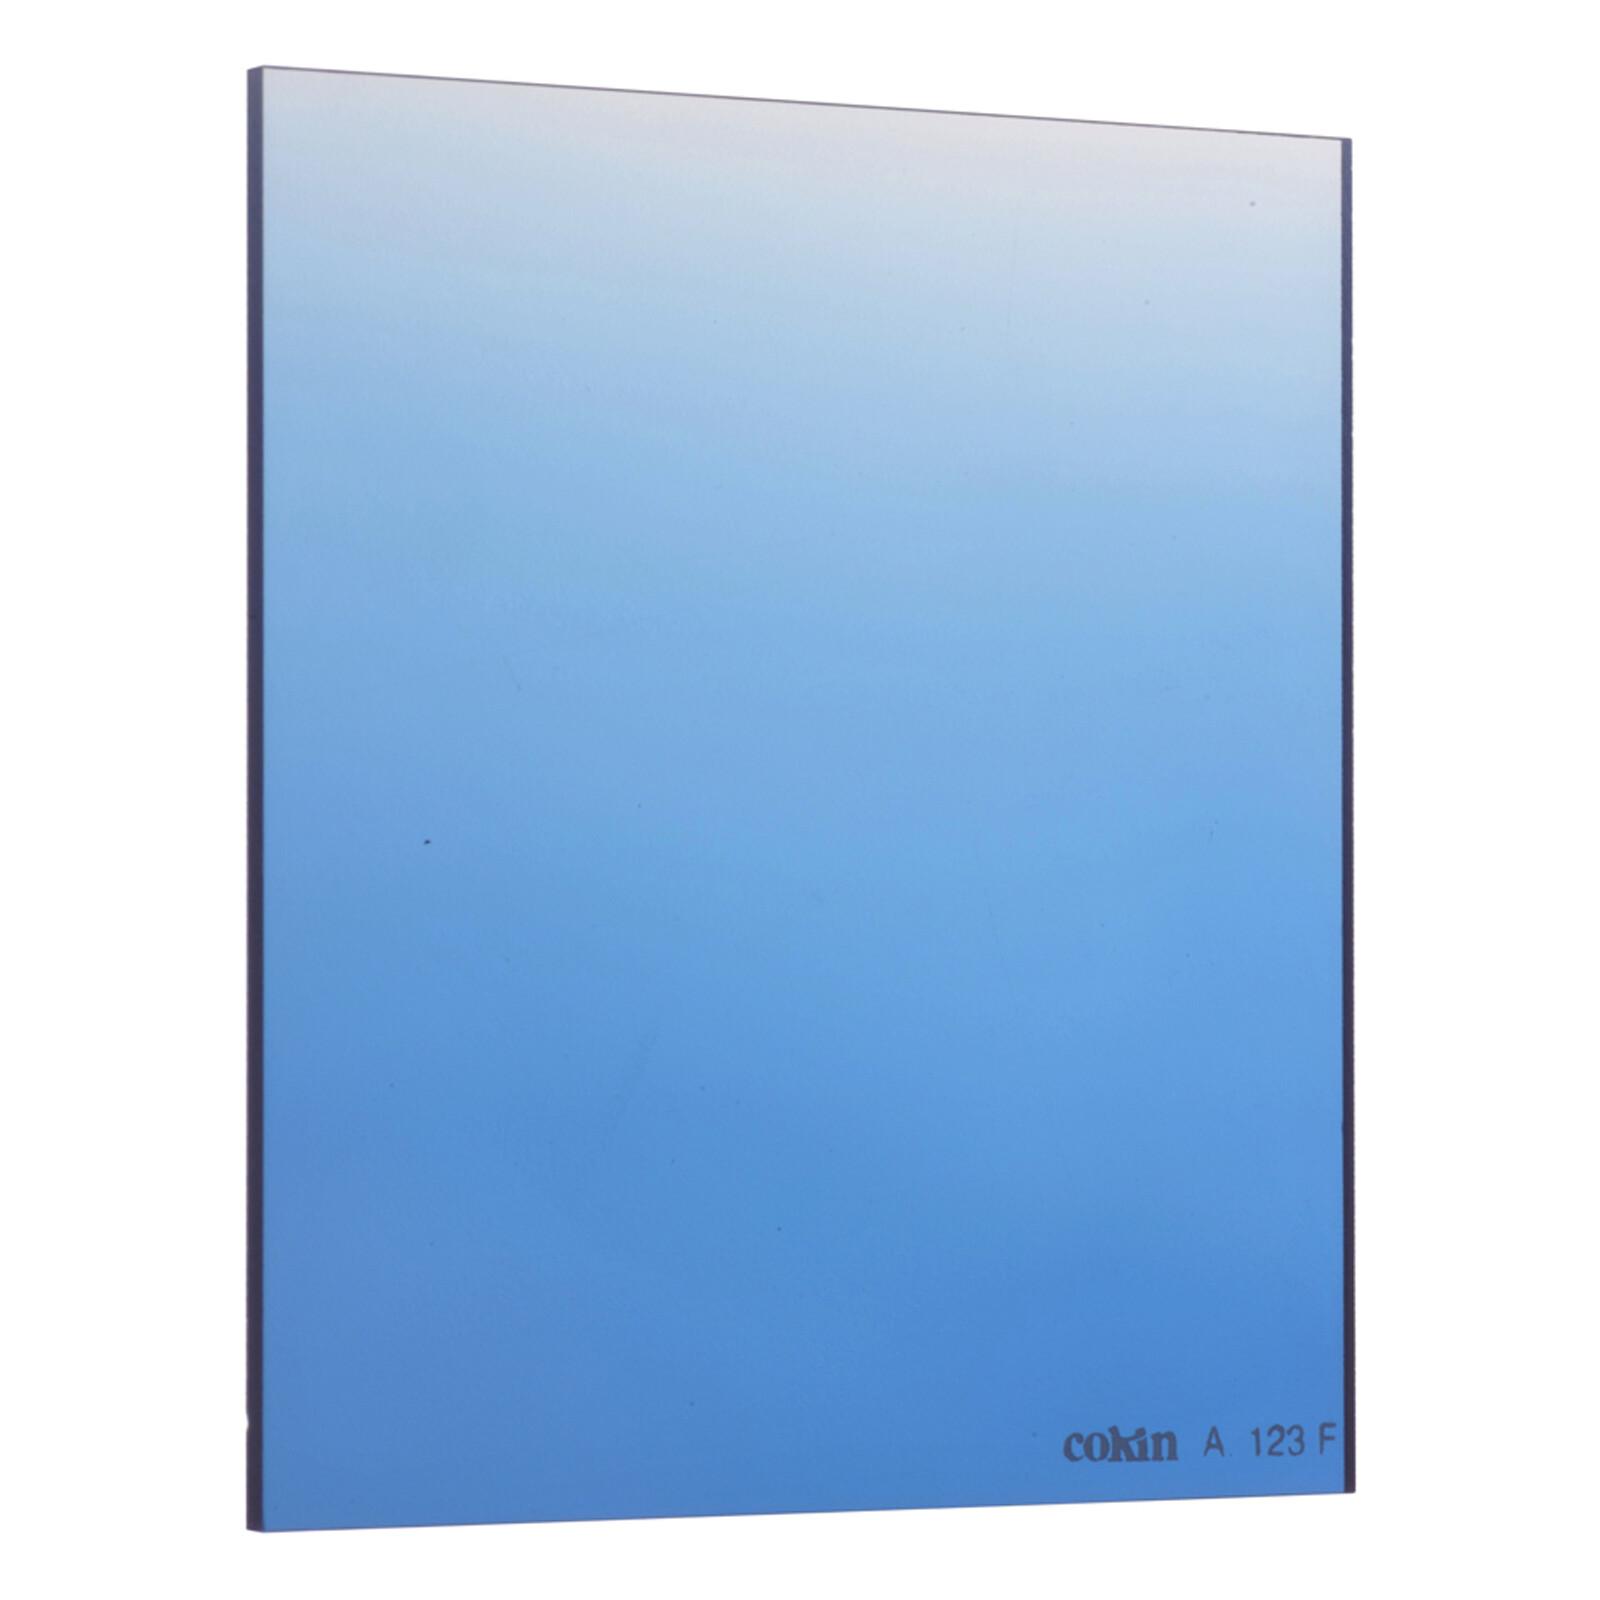 Cokin P123F Verlauf Blau 2F